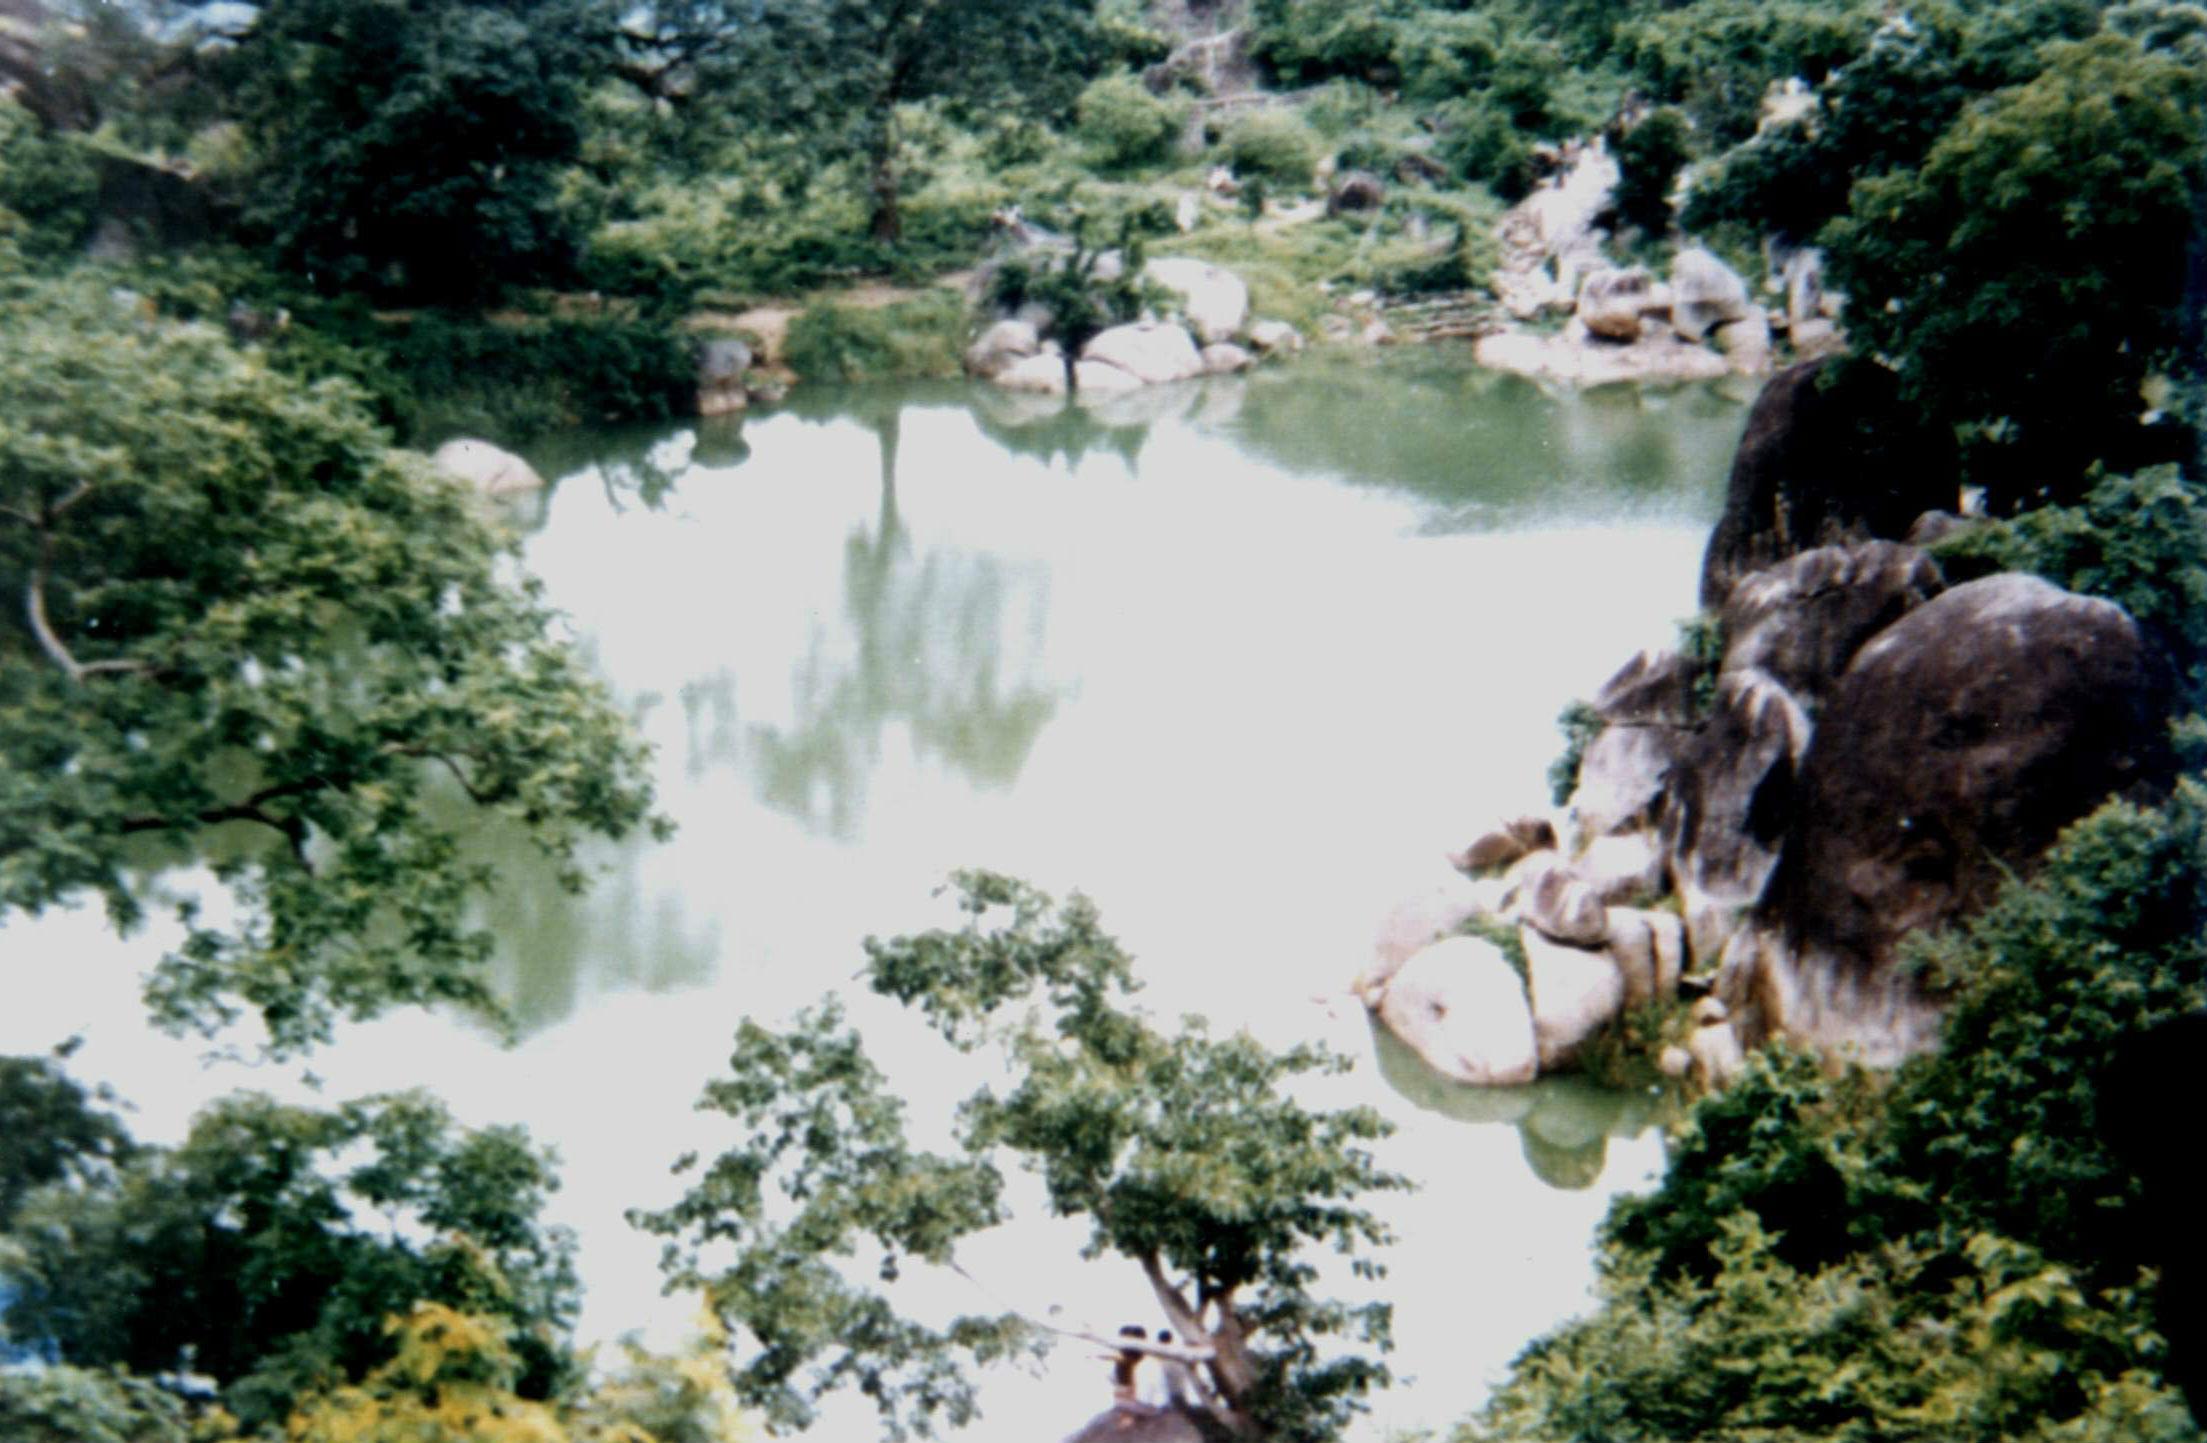 Malanjhkudum Falls - Kanker Image